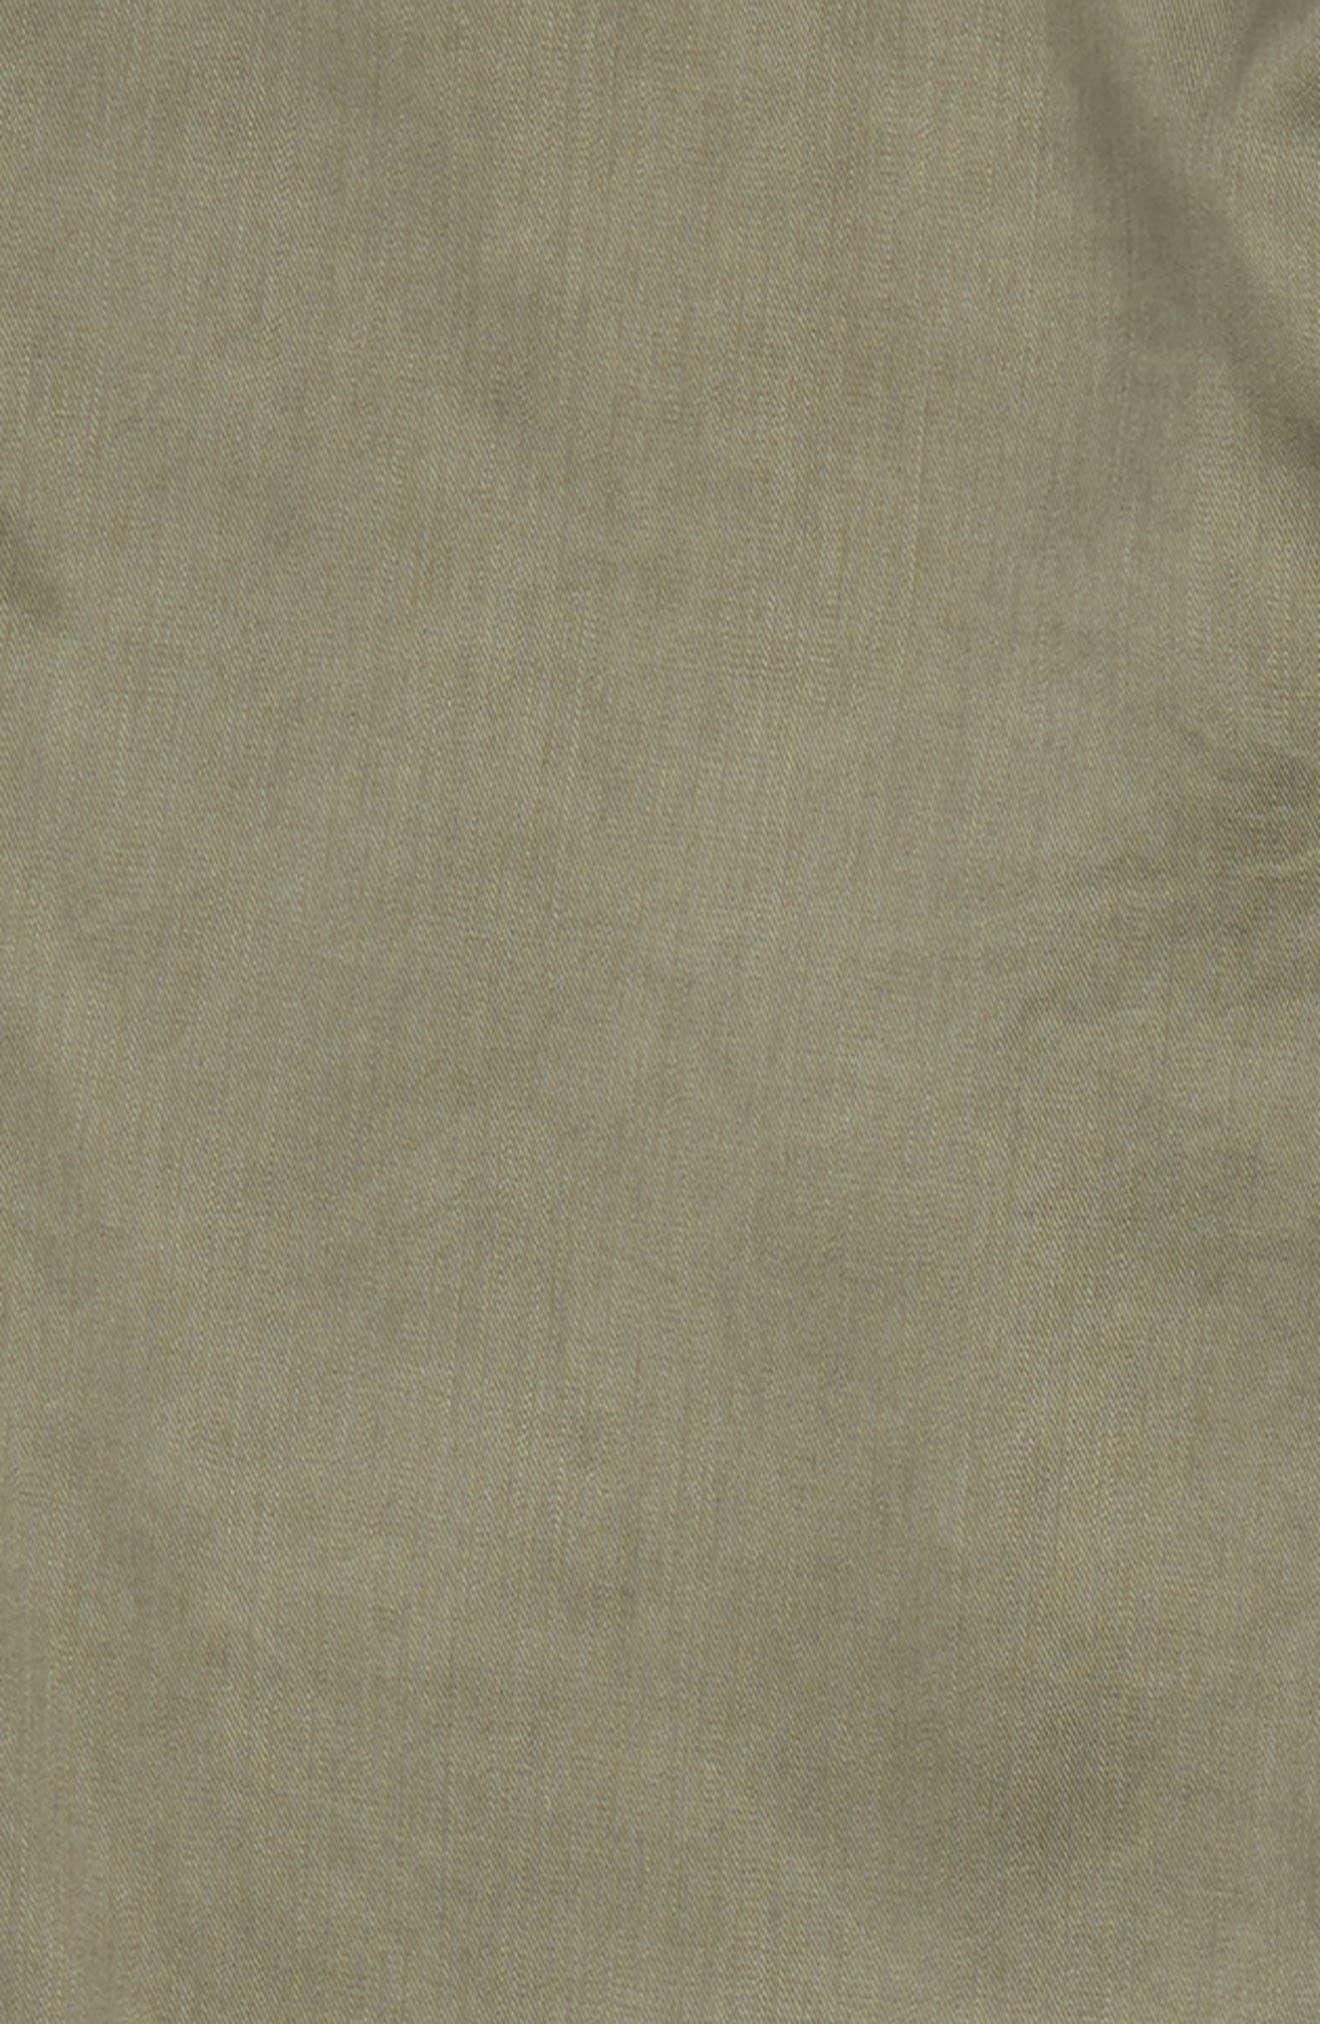 Woven Jogger Pants,                             Alternate thumbnail 5, color,                             Olive Grove